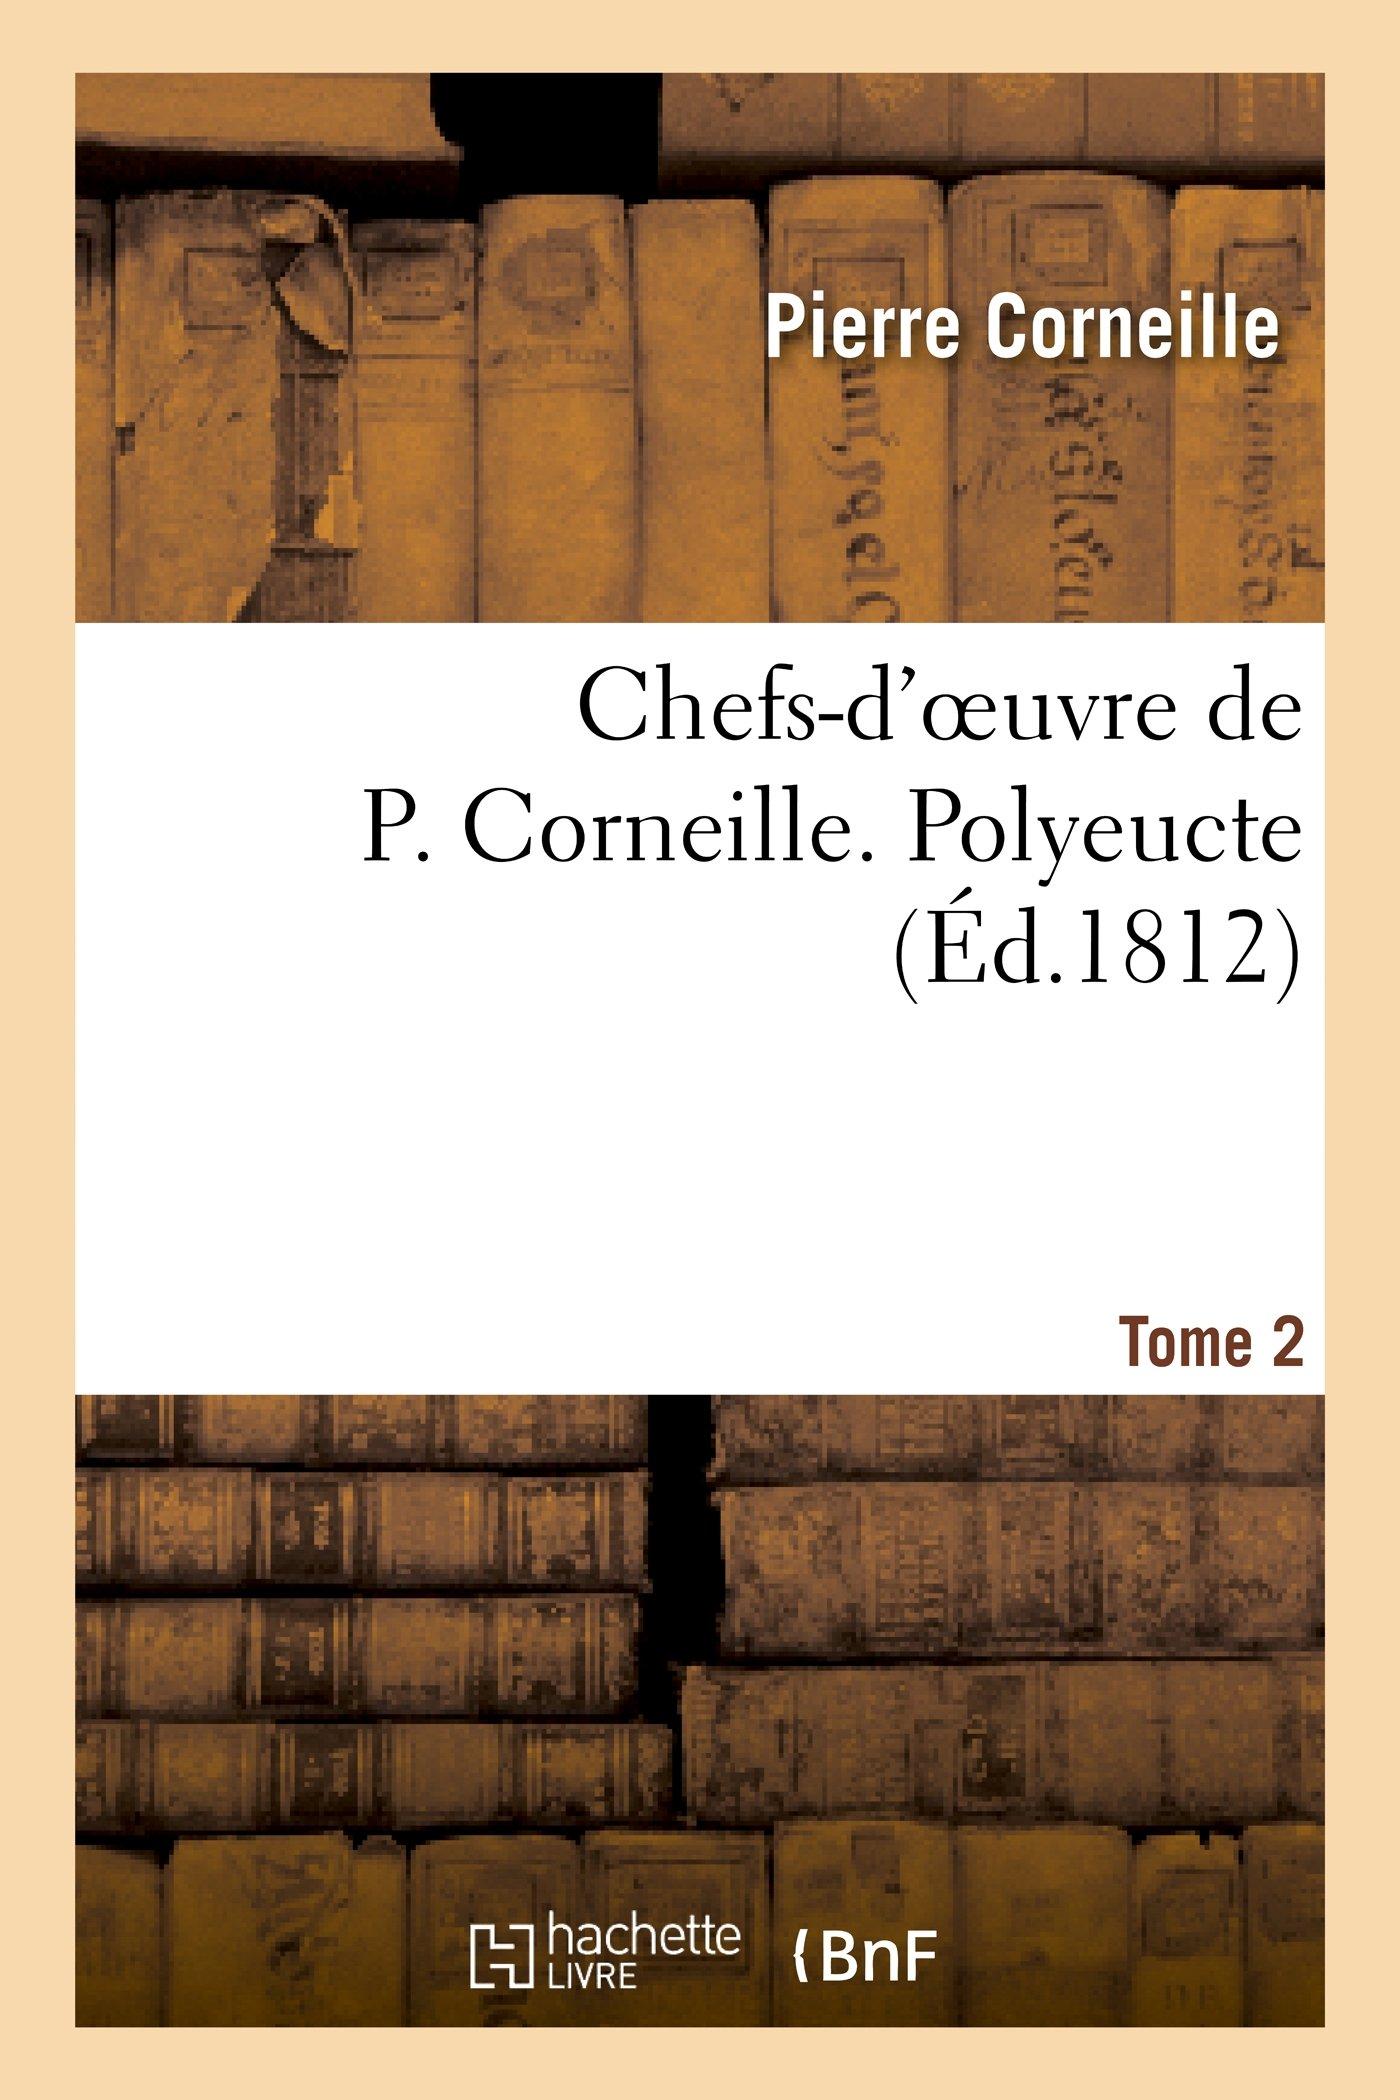 Chefs-D'Oeuvre de P. Corneille. Tome 2 Polyeucte (Litterature) (French Edition) pdf epub